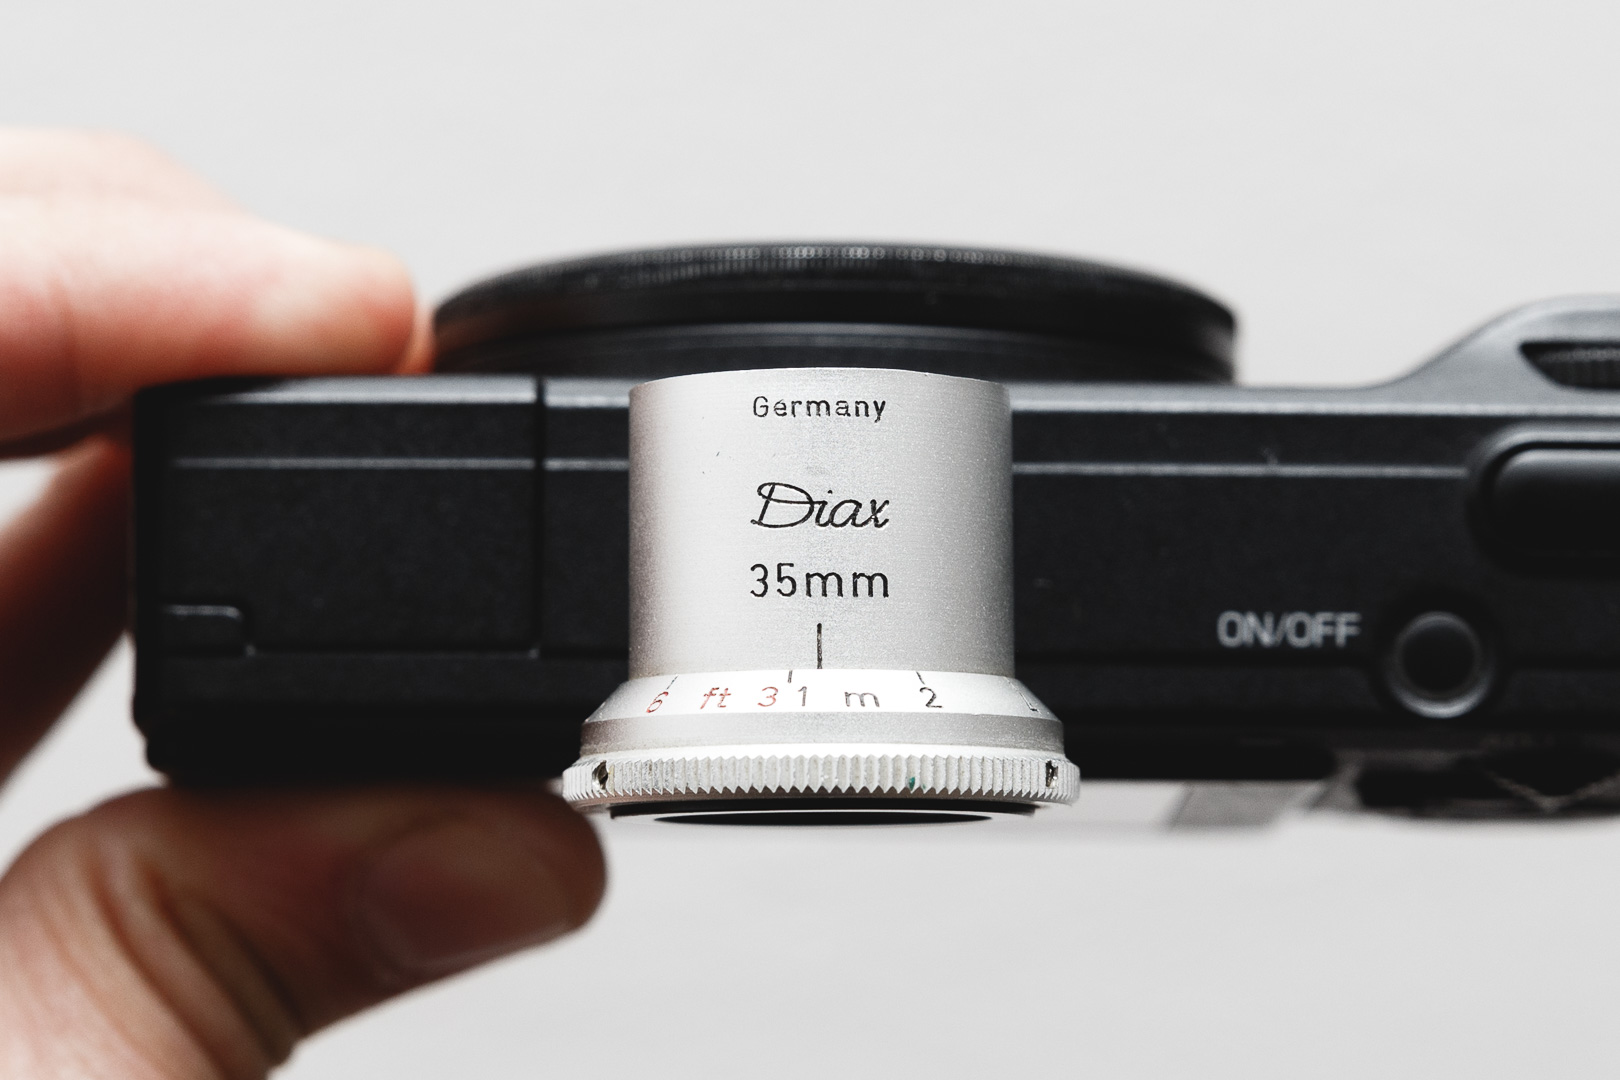 Diax-35mm-finder-Ant Tran-20170402-2971.jpg